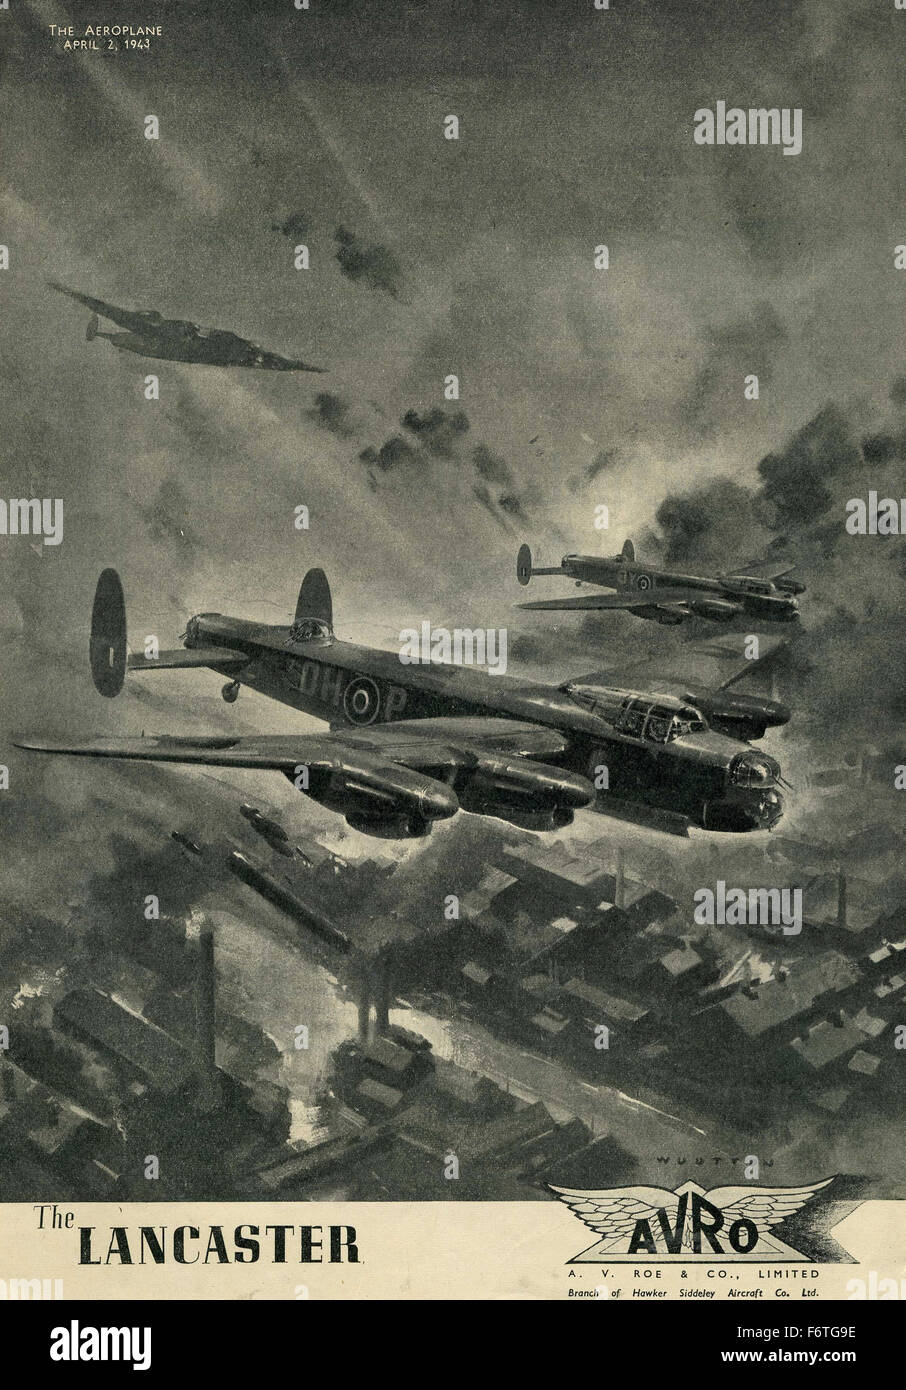 Lancaster Avro bomber WW2 1943 advert Stock Photo